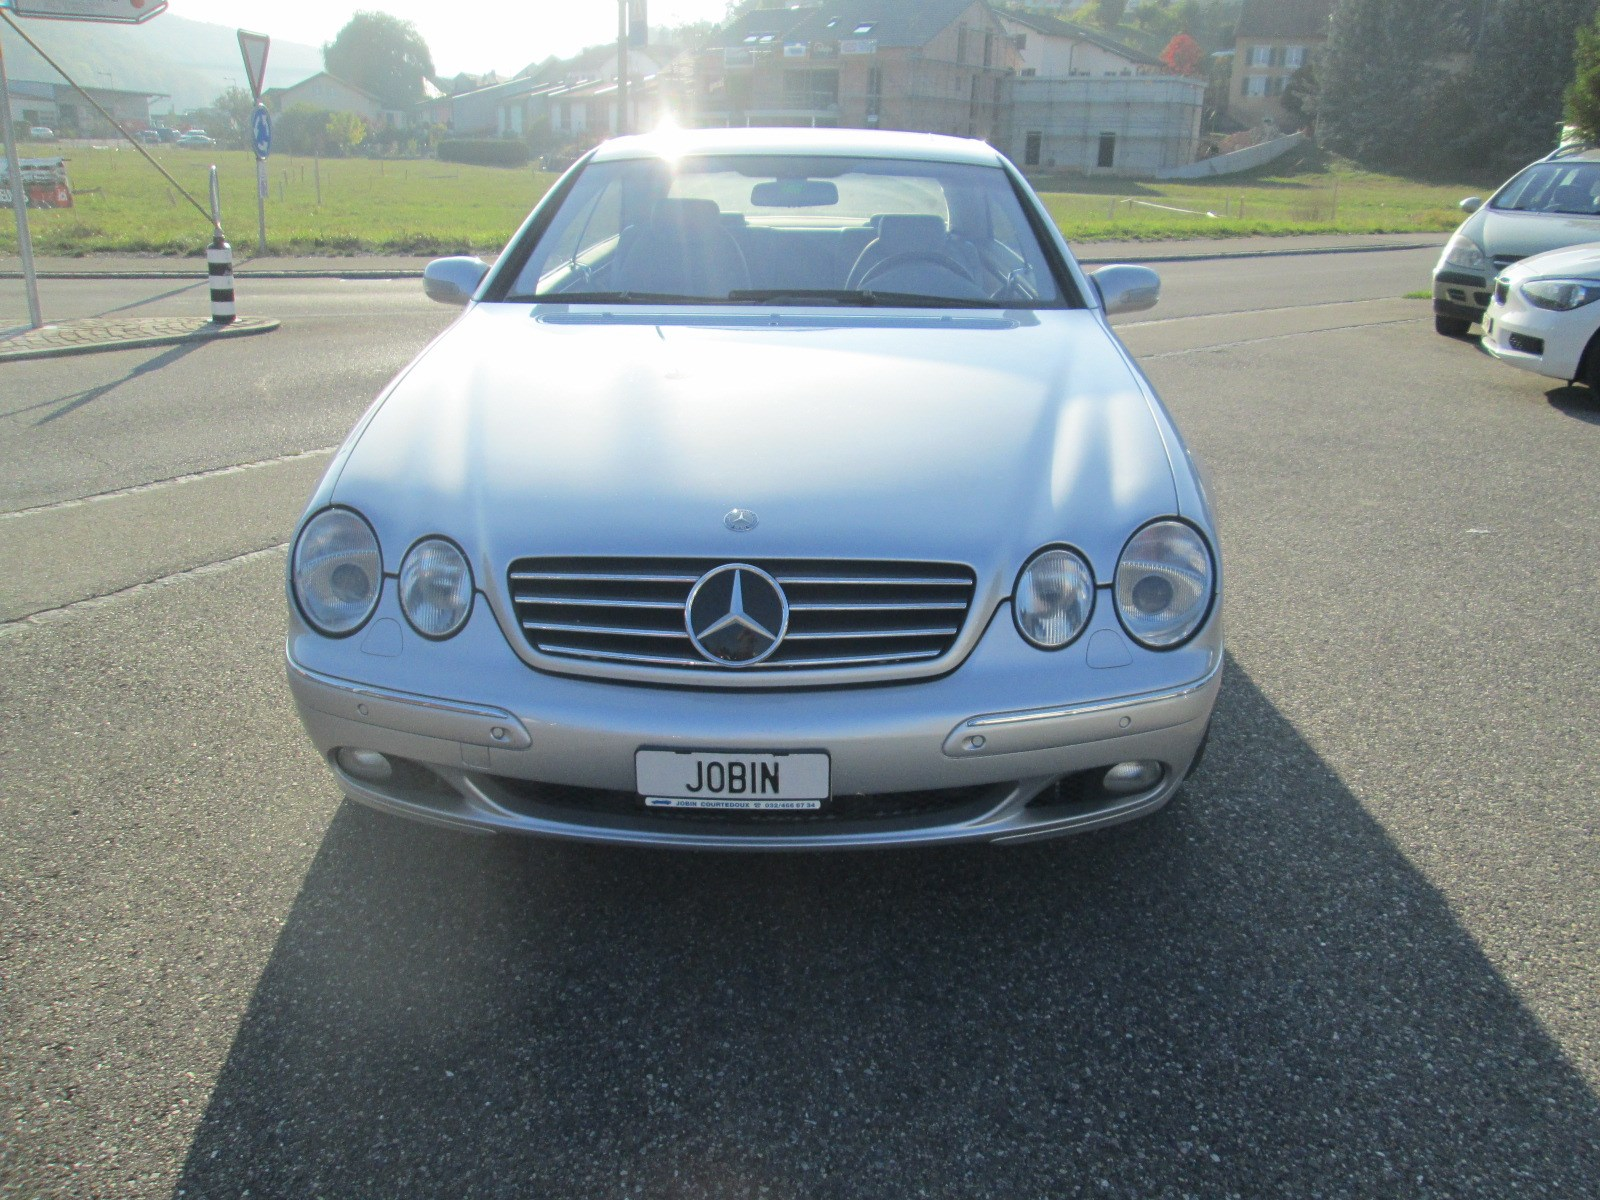 coupe Mercedes-Benz CL 600 Automatic